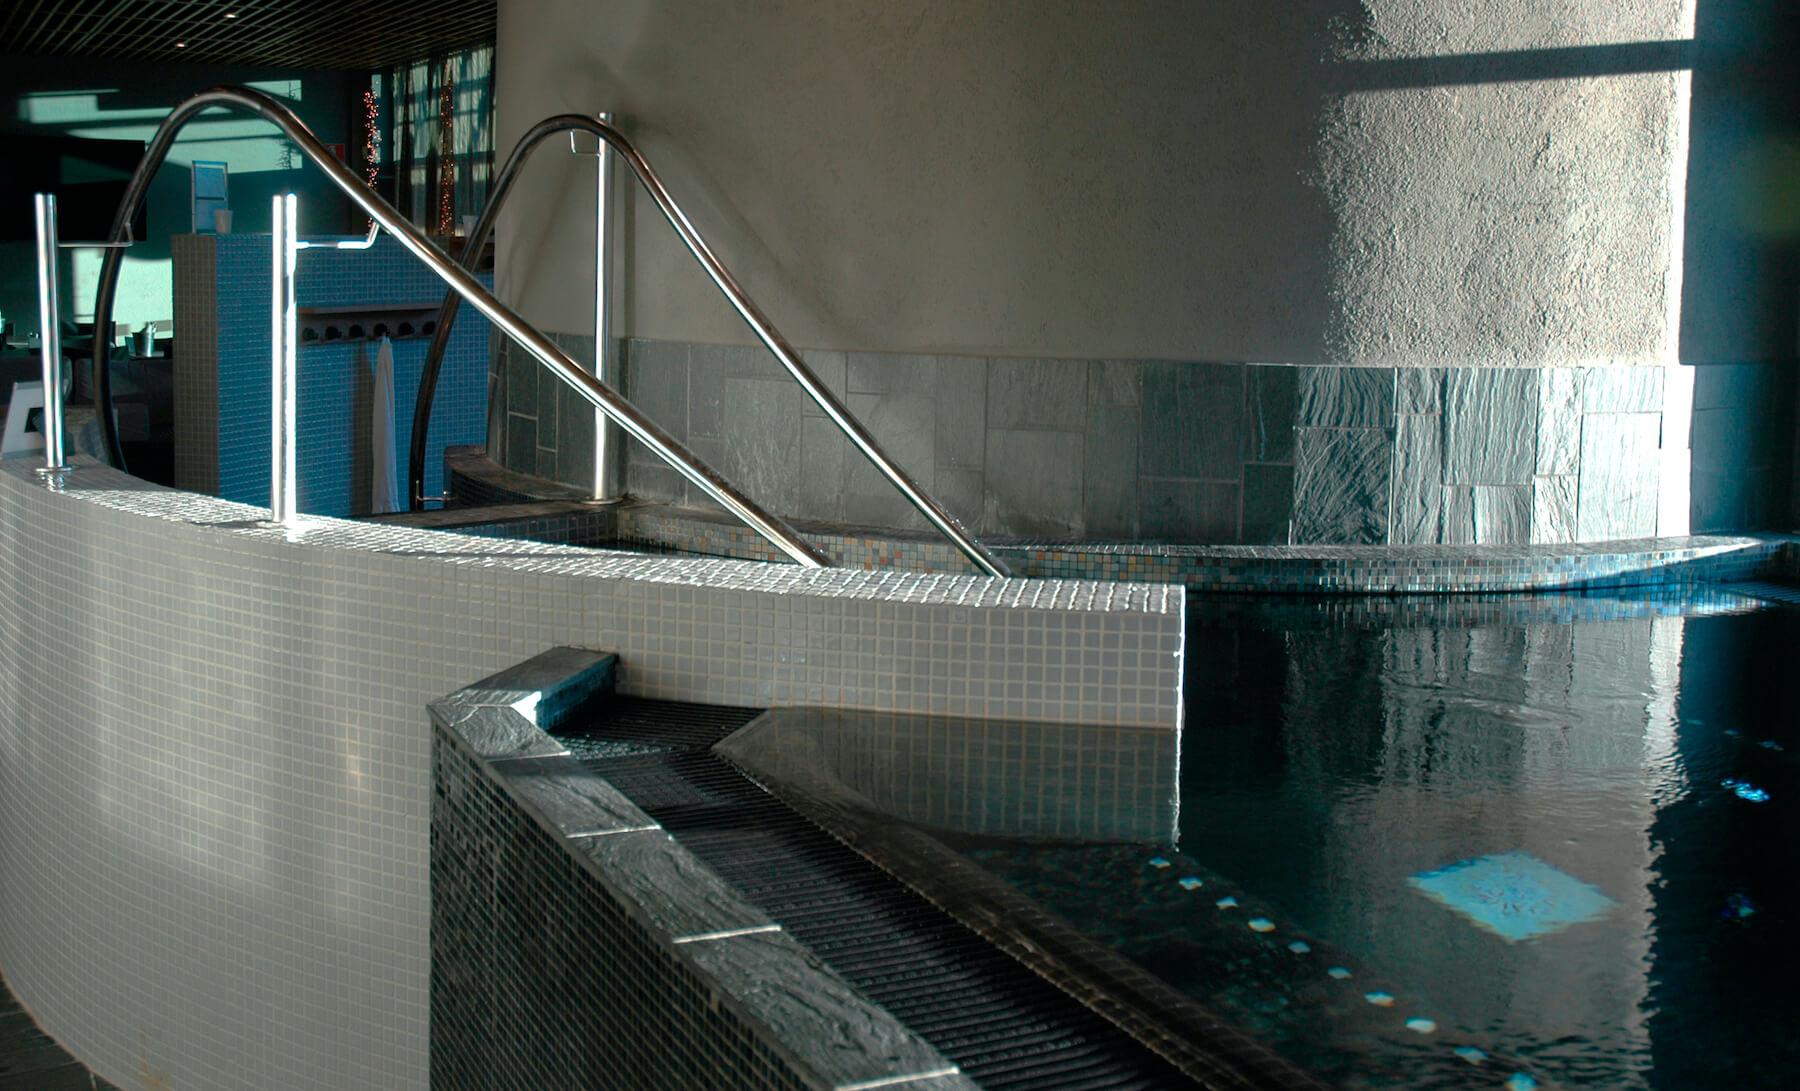 slate tiles by swimming pool